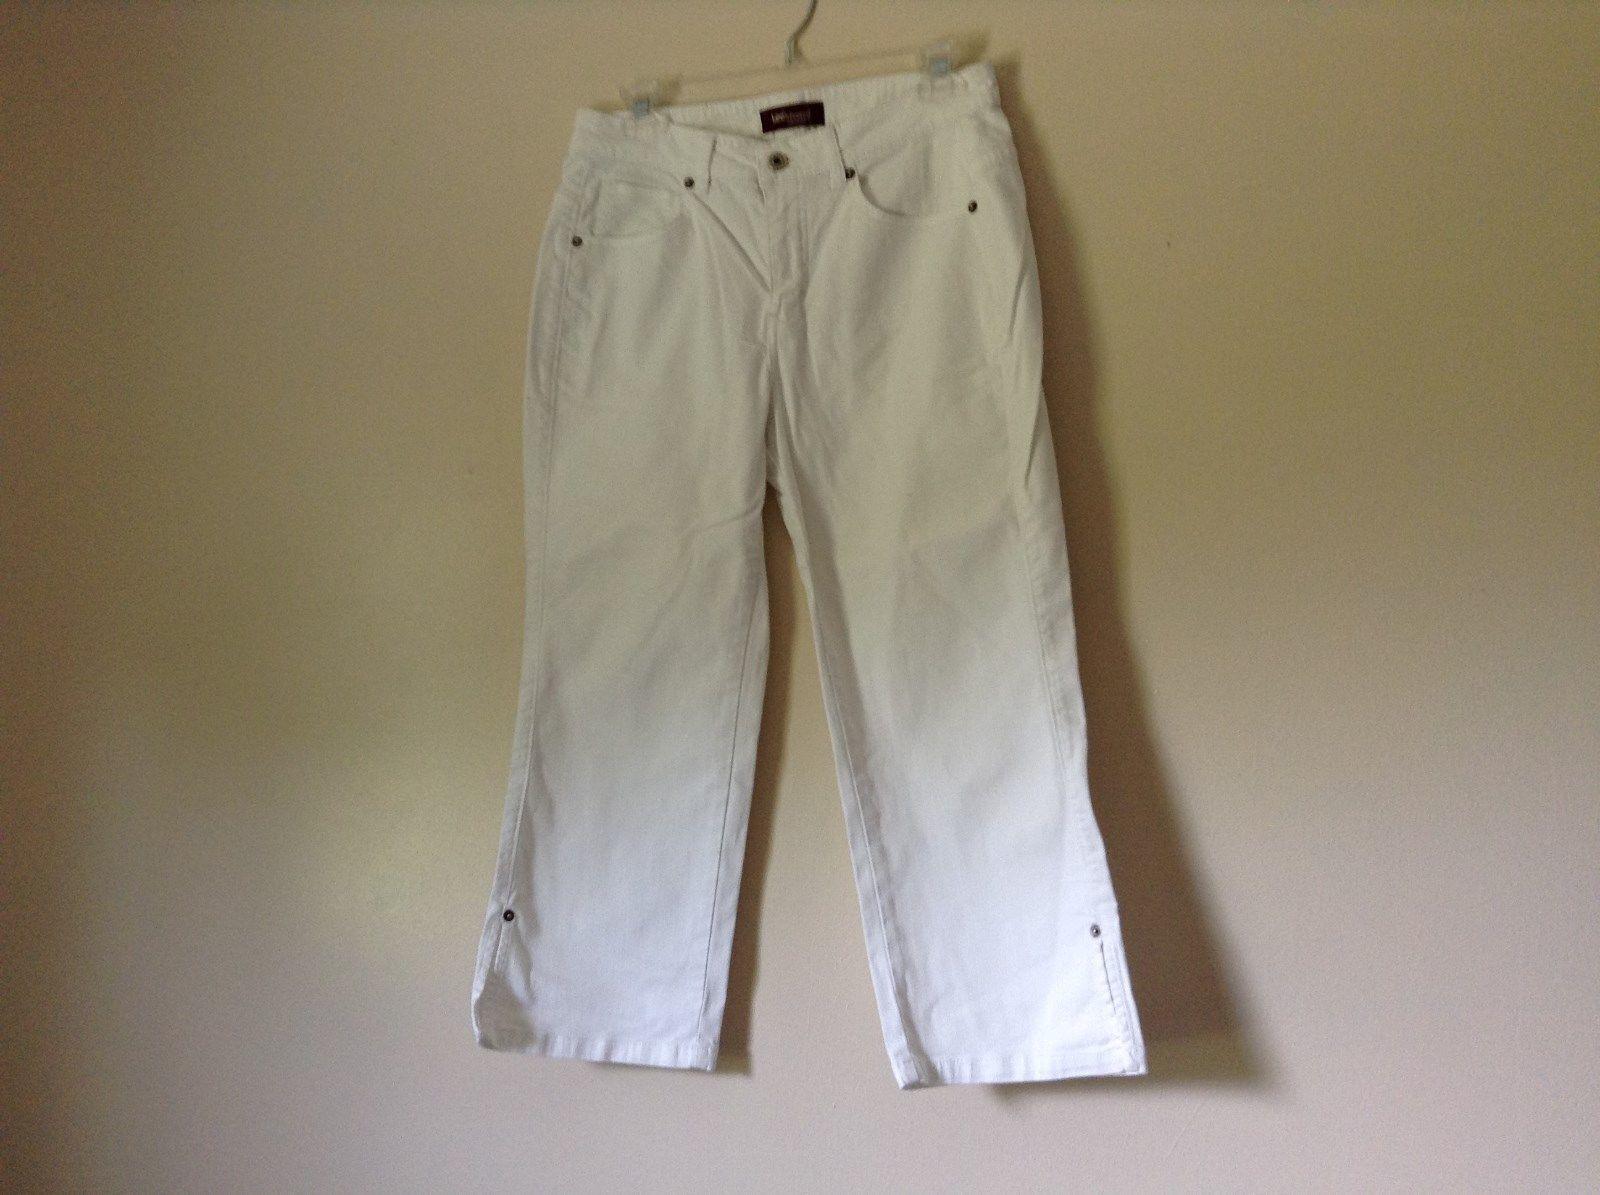 Lee Riveted Ultimate 5 White Capri Pants Size 8M